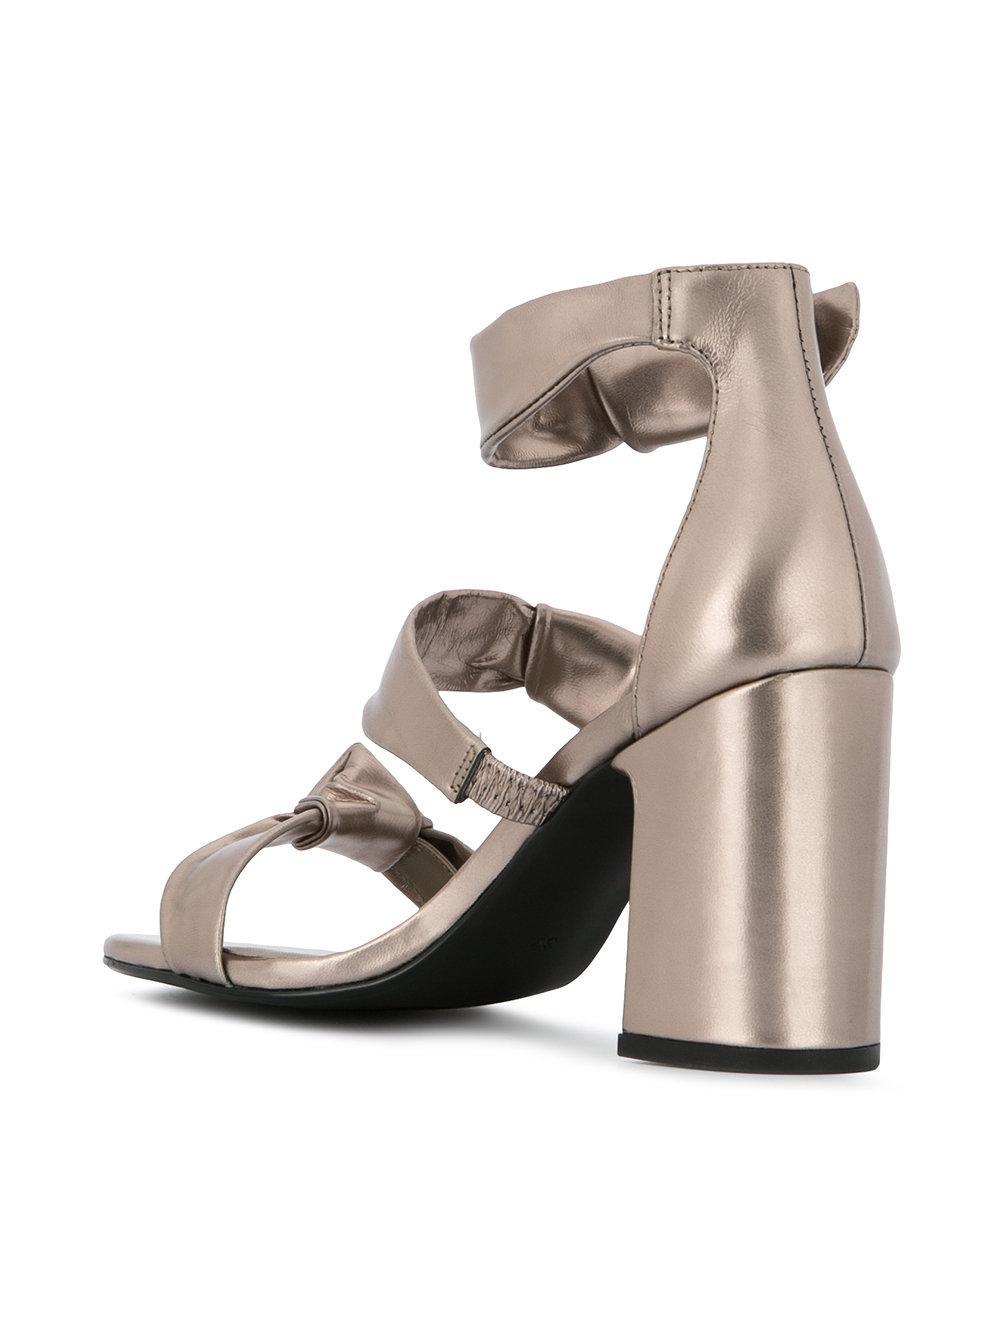 Melvy III sandals - Metallic Senso c6hldD